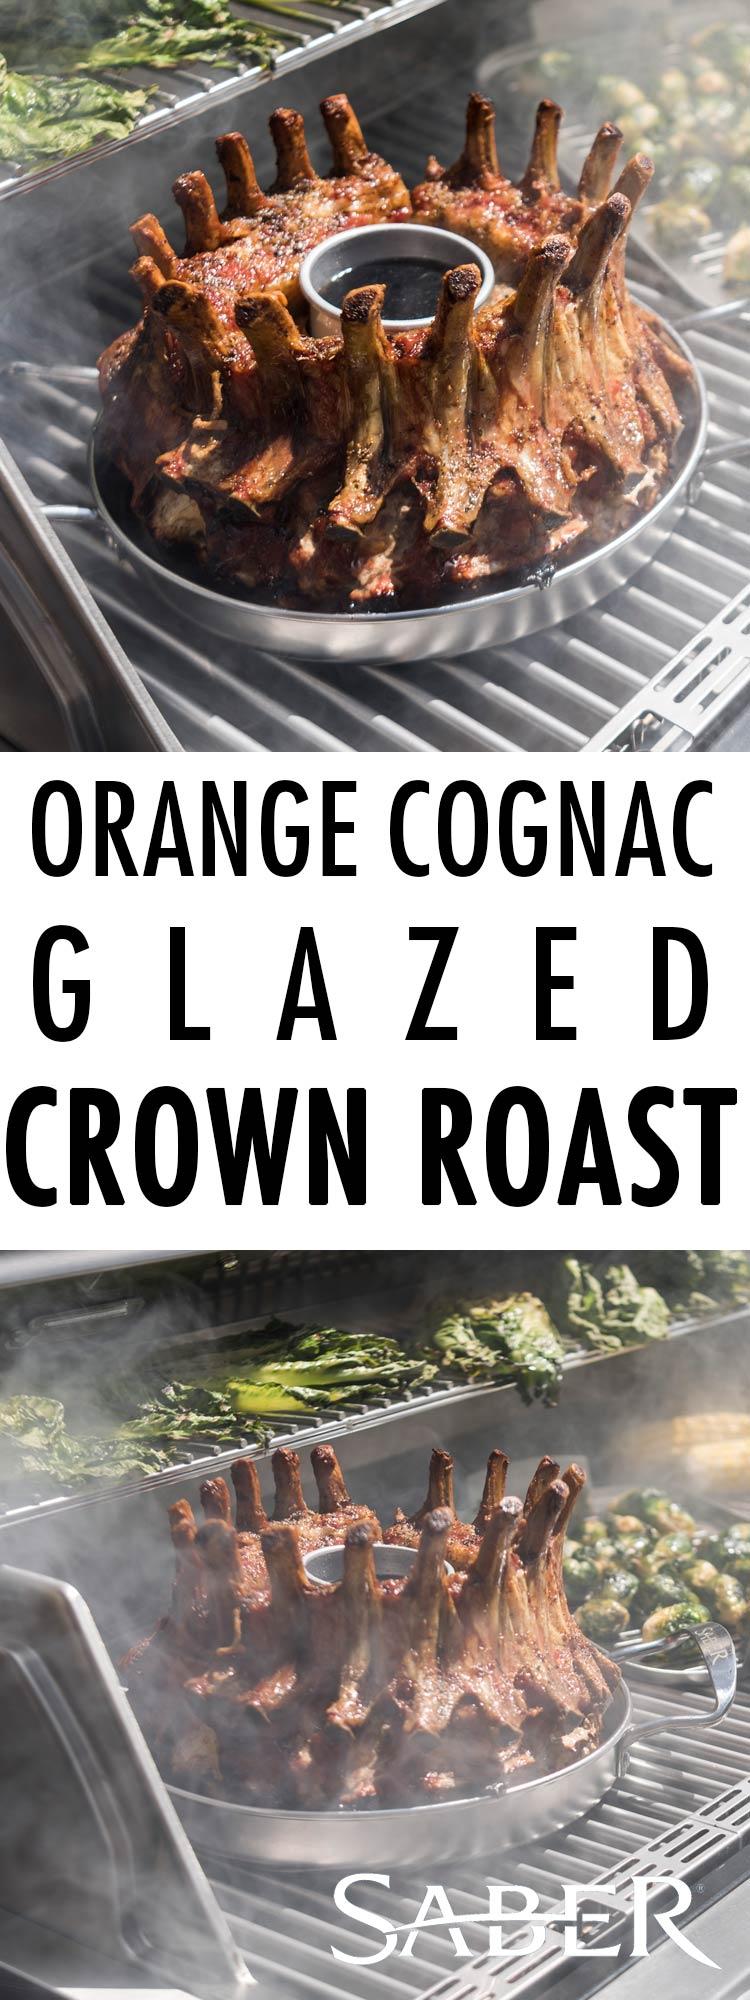 Orange Cognac Glazed Crown Roast